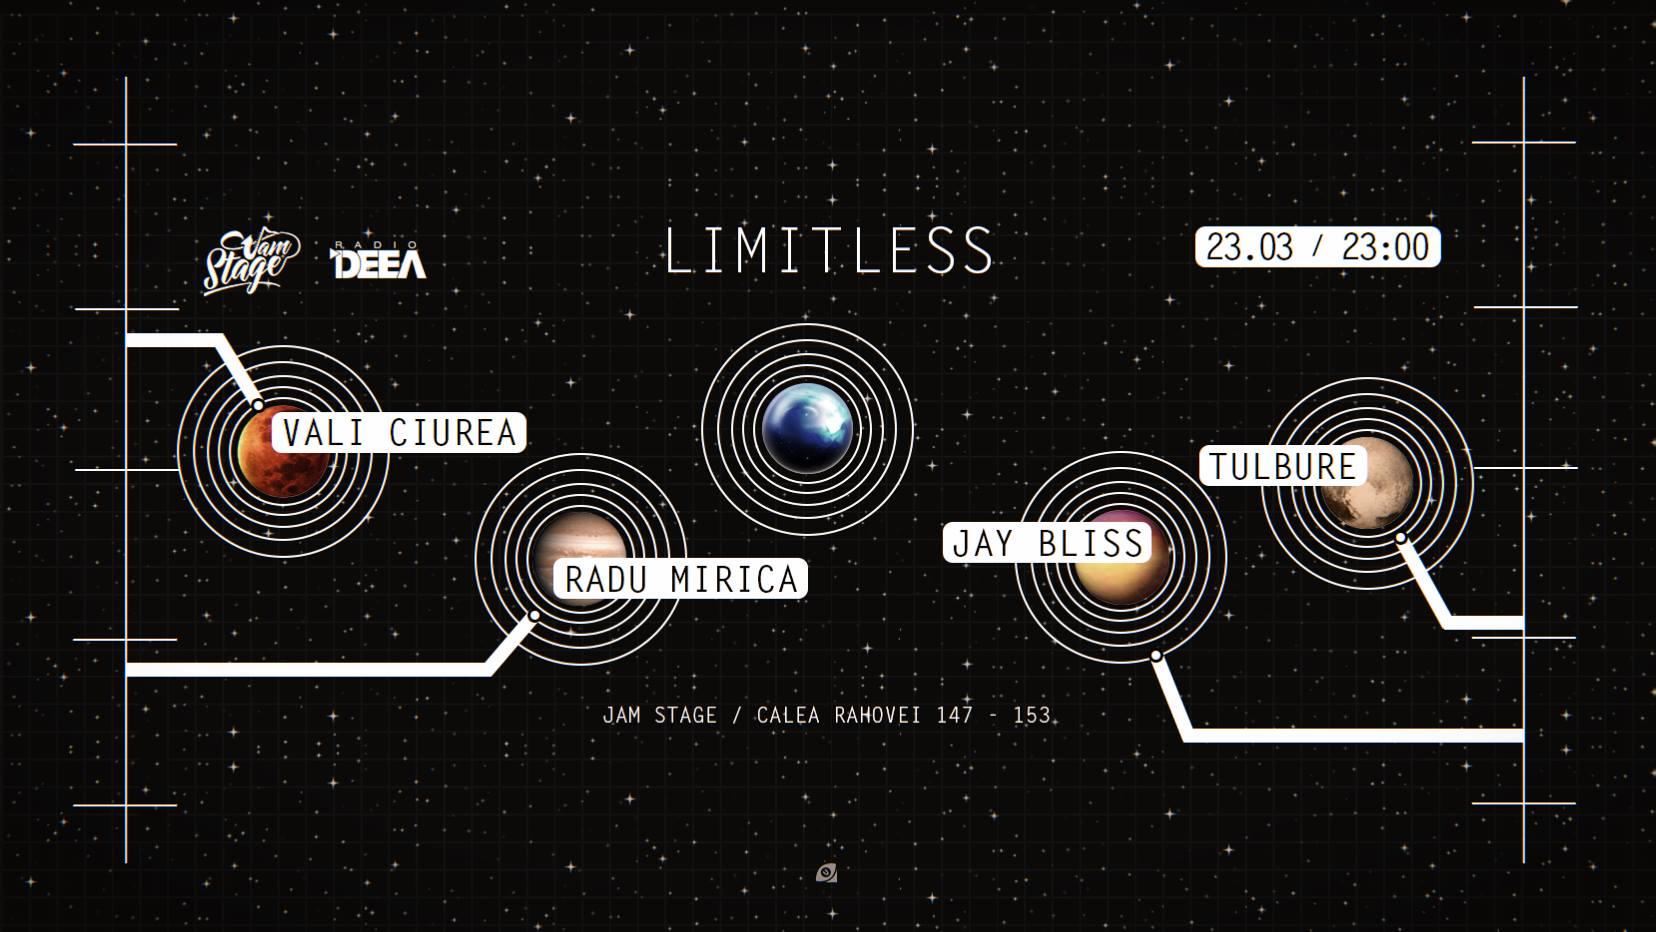 Limitless w Jay Bliss, Tulbure, Radu Mirica, Vali Ciurea